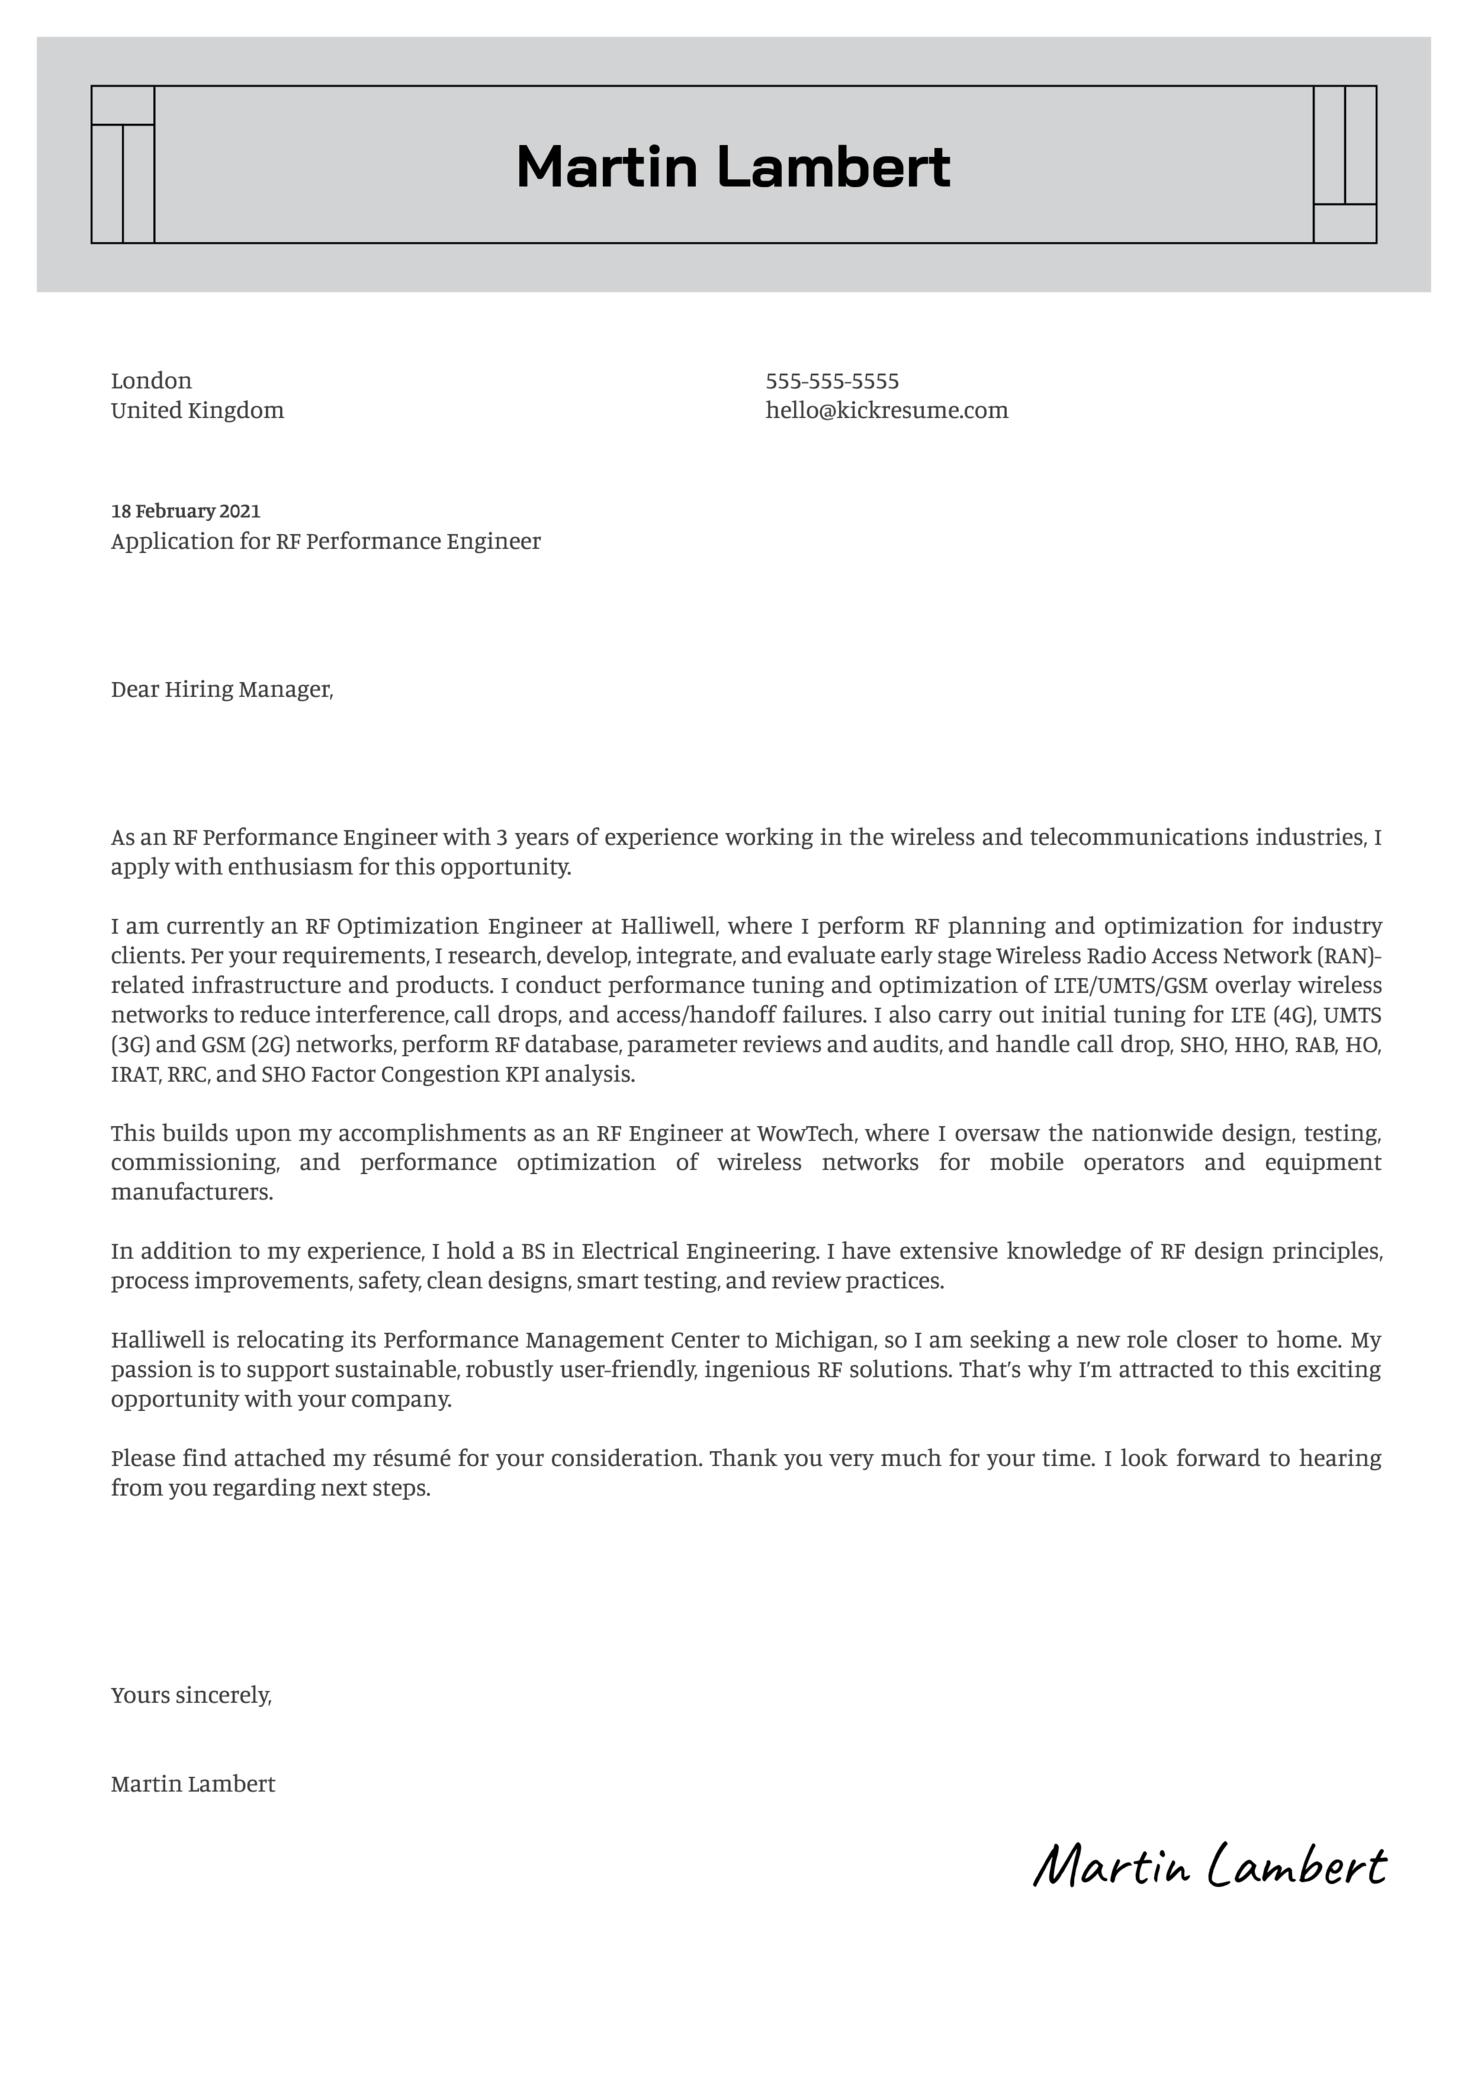 RF Performance Engineer Cover Letter Sample